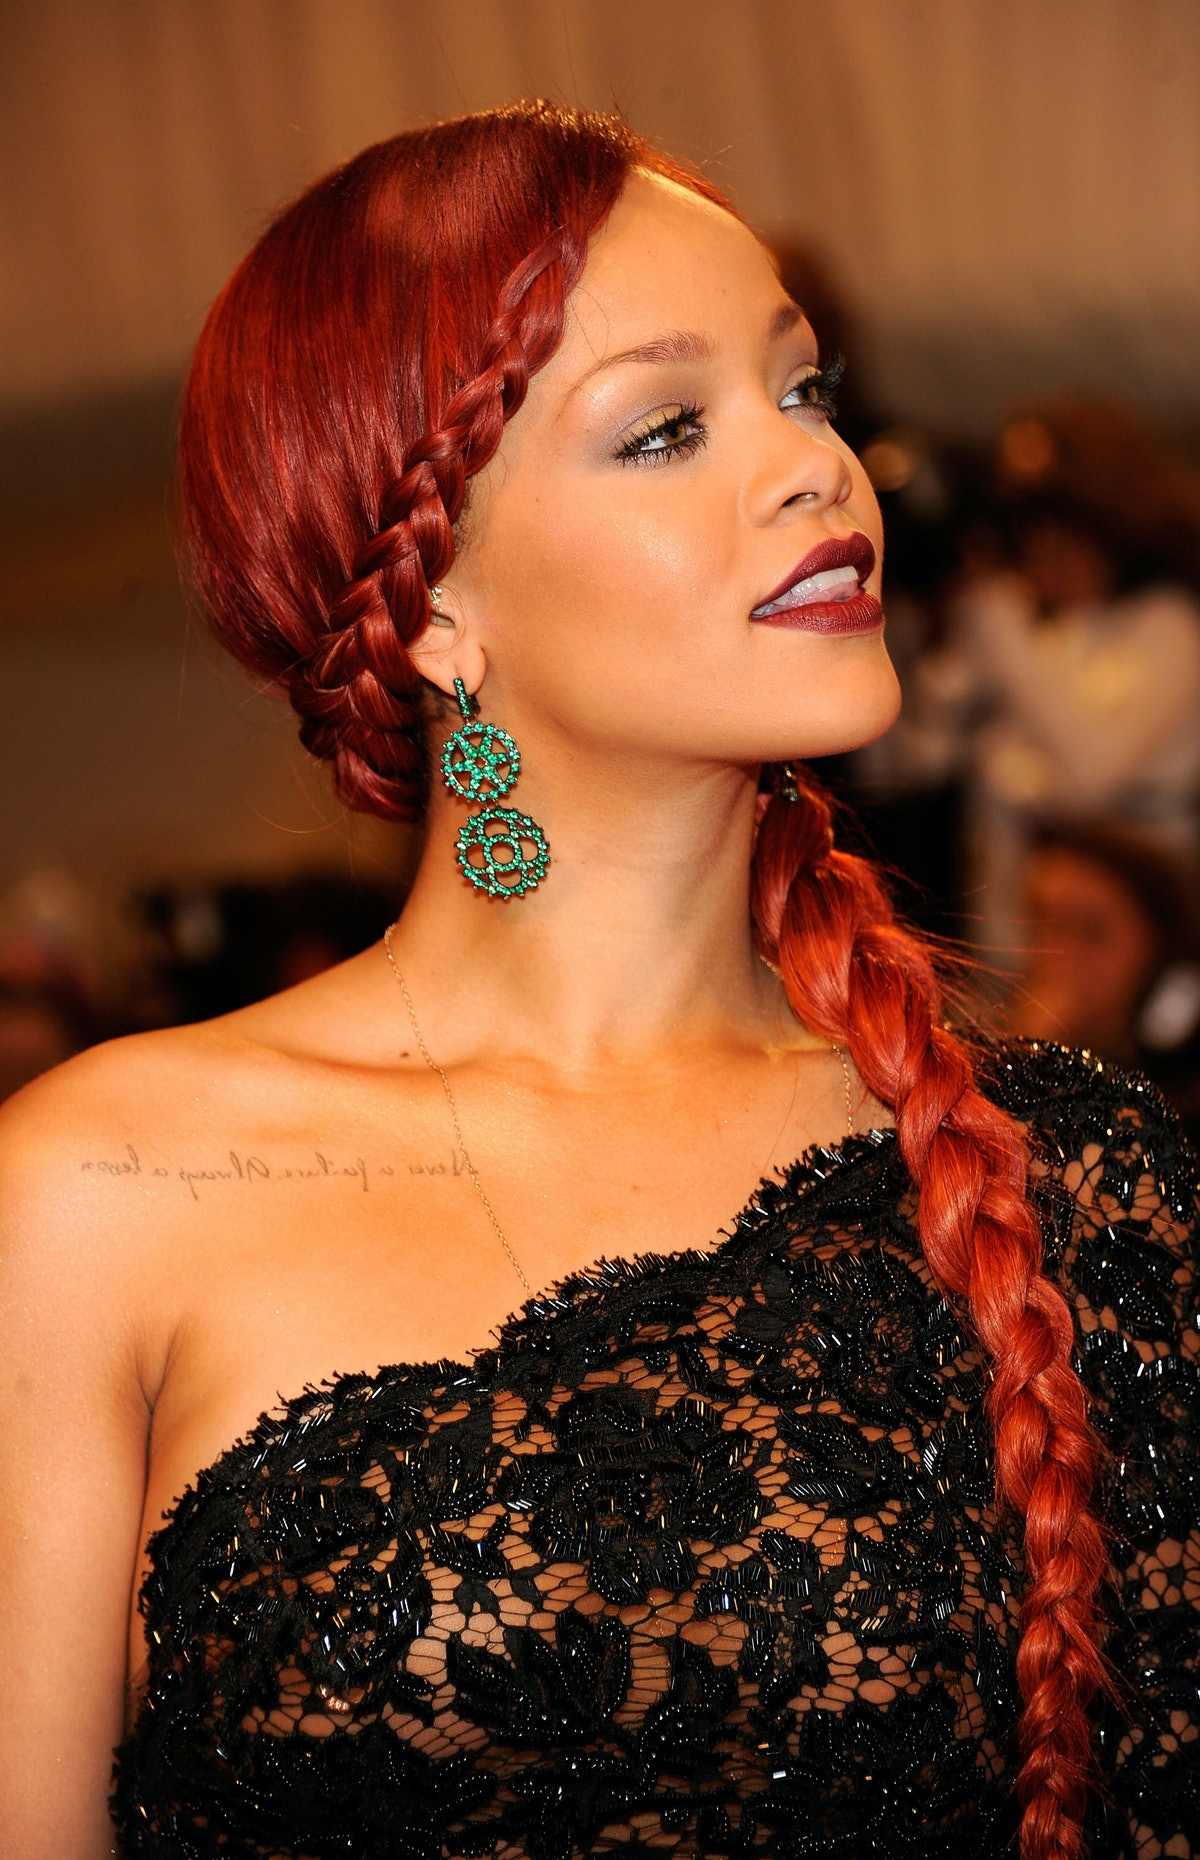 Rihanna with red dress